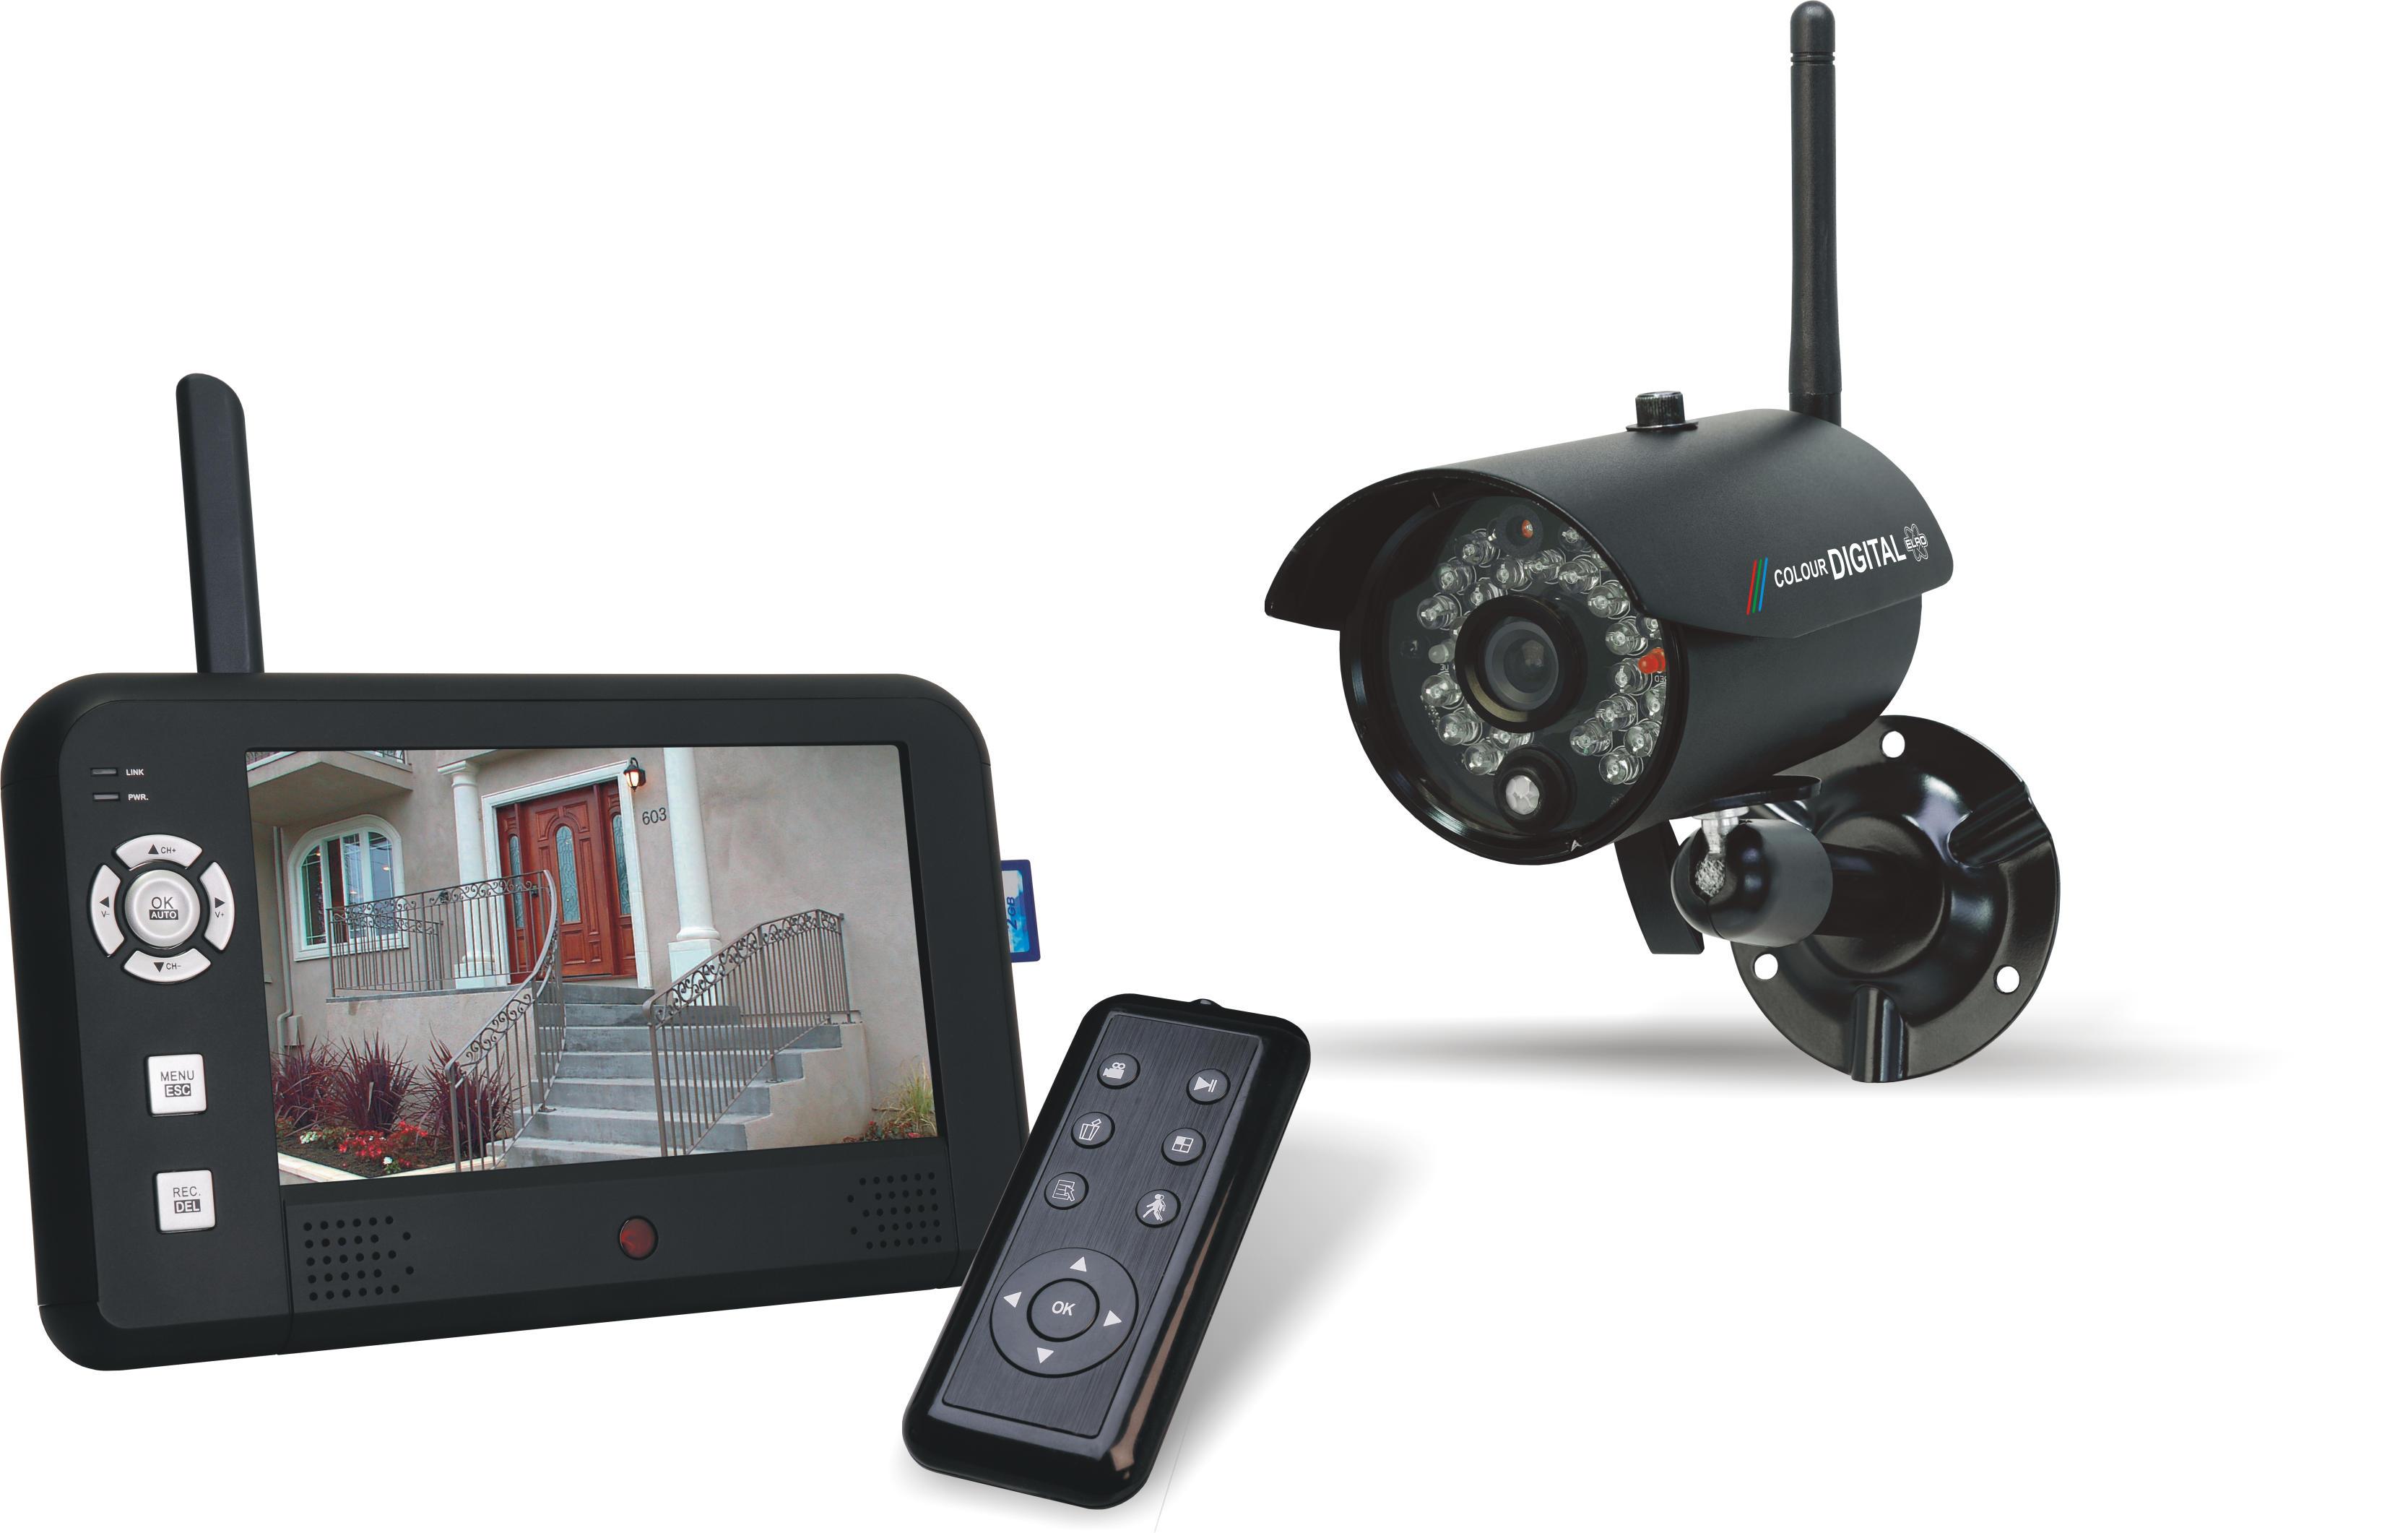 berwachungskamera test kamerasystem elro cs95dvr. Black Bedroom Furniture Sets. Home Design Ideas